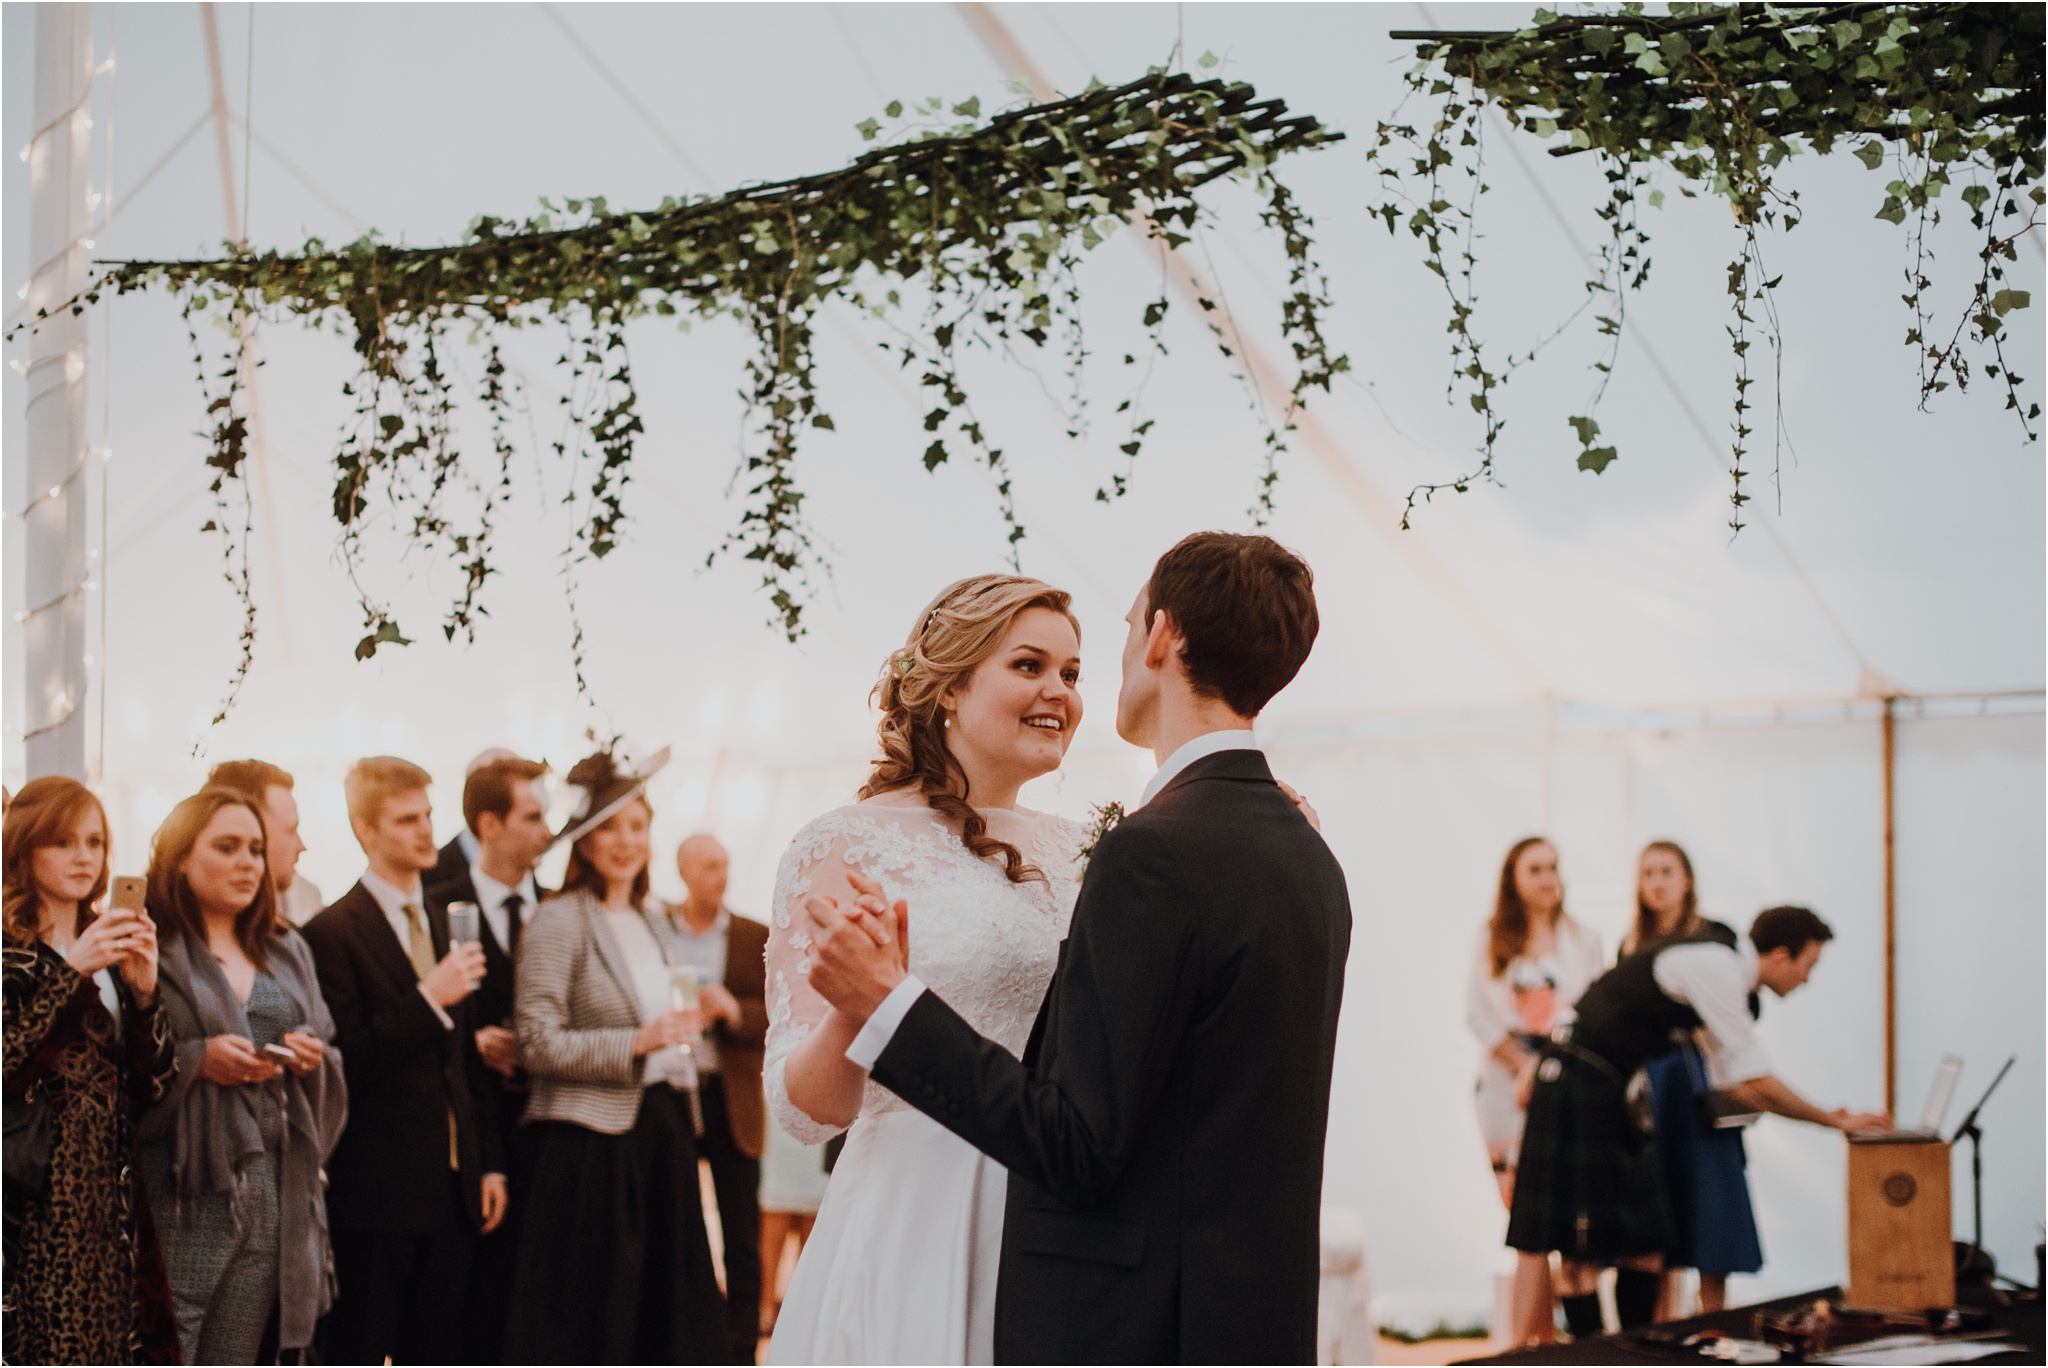 Outdoor-country-wedding-Edinburgh-photographer__0138.jpg